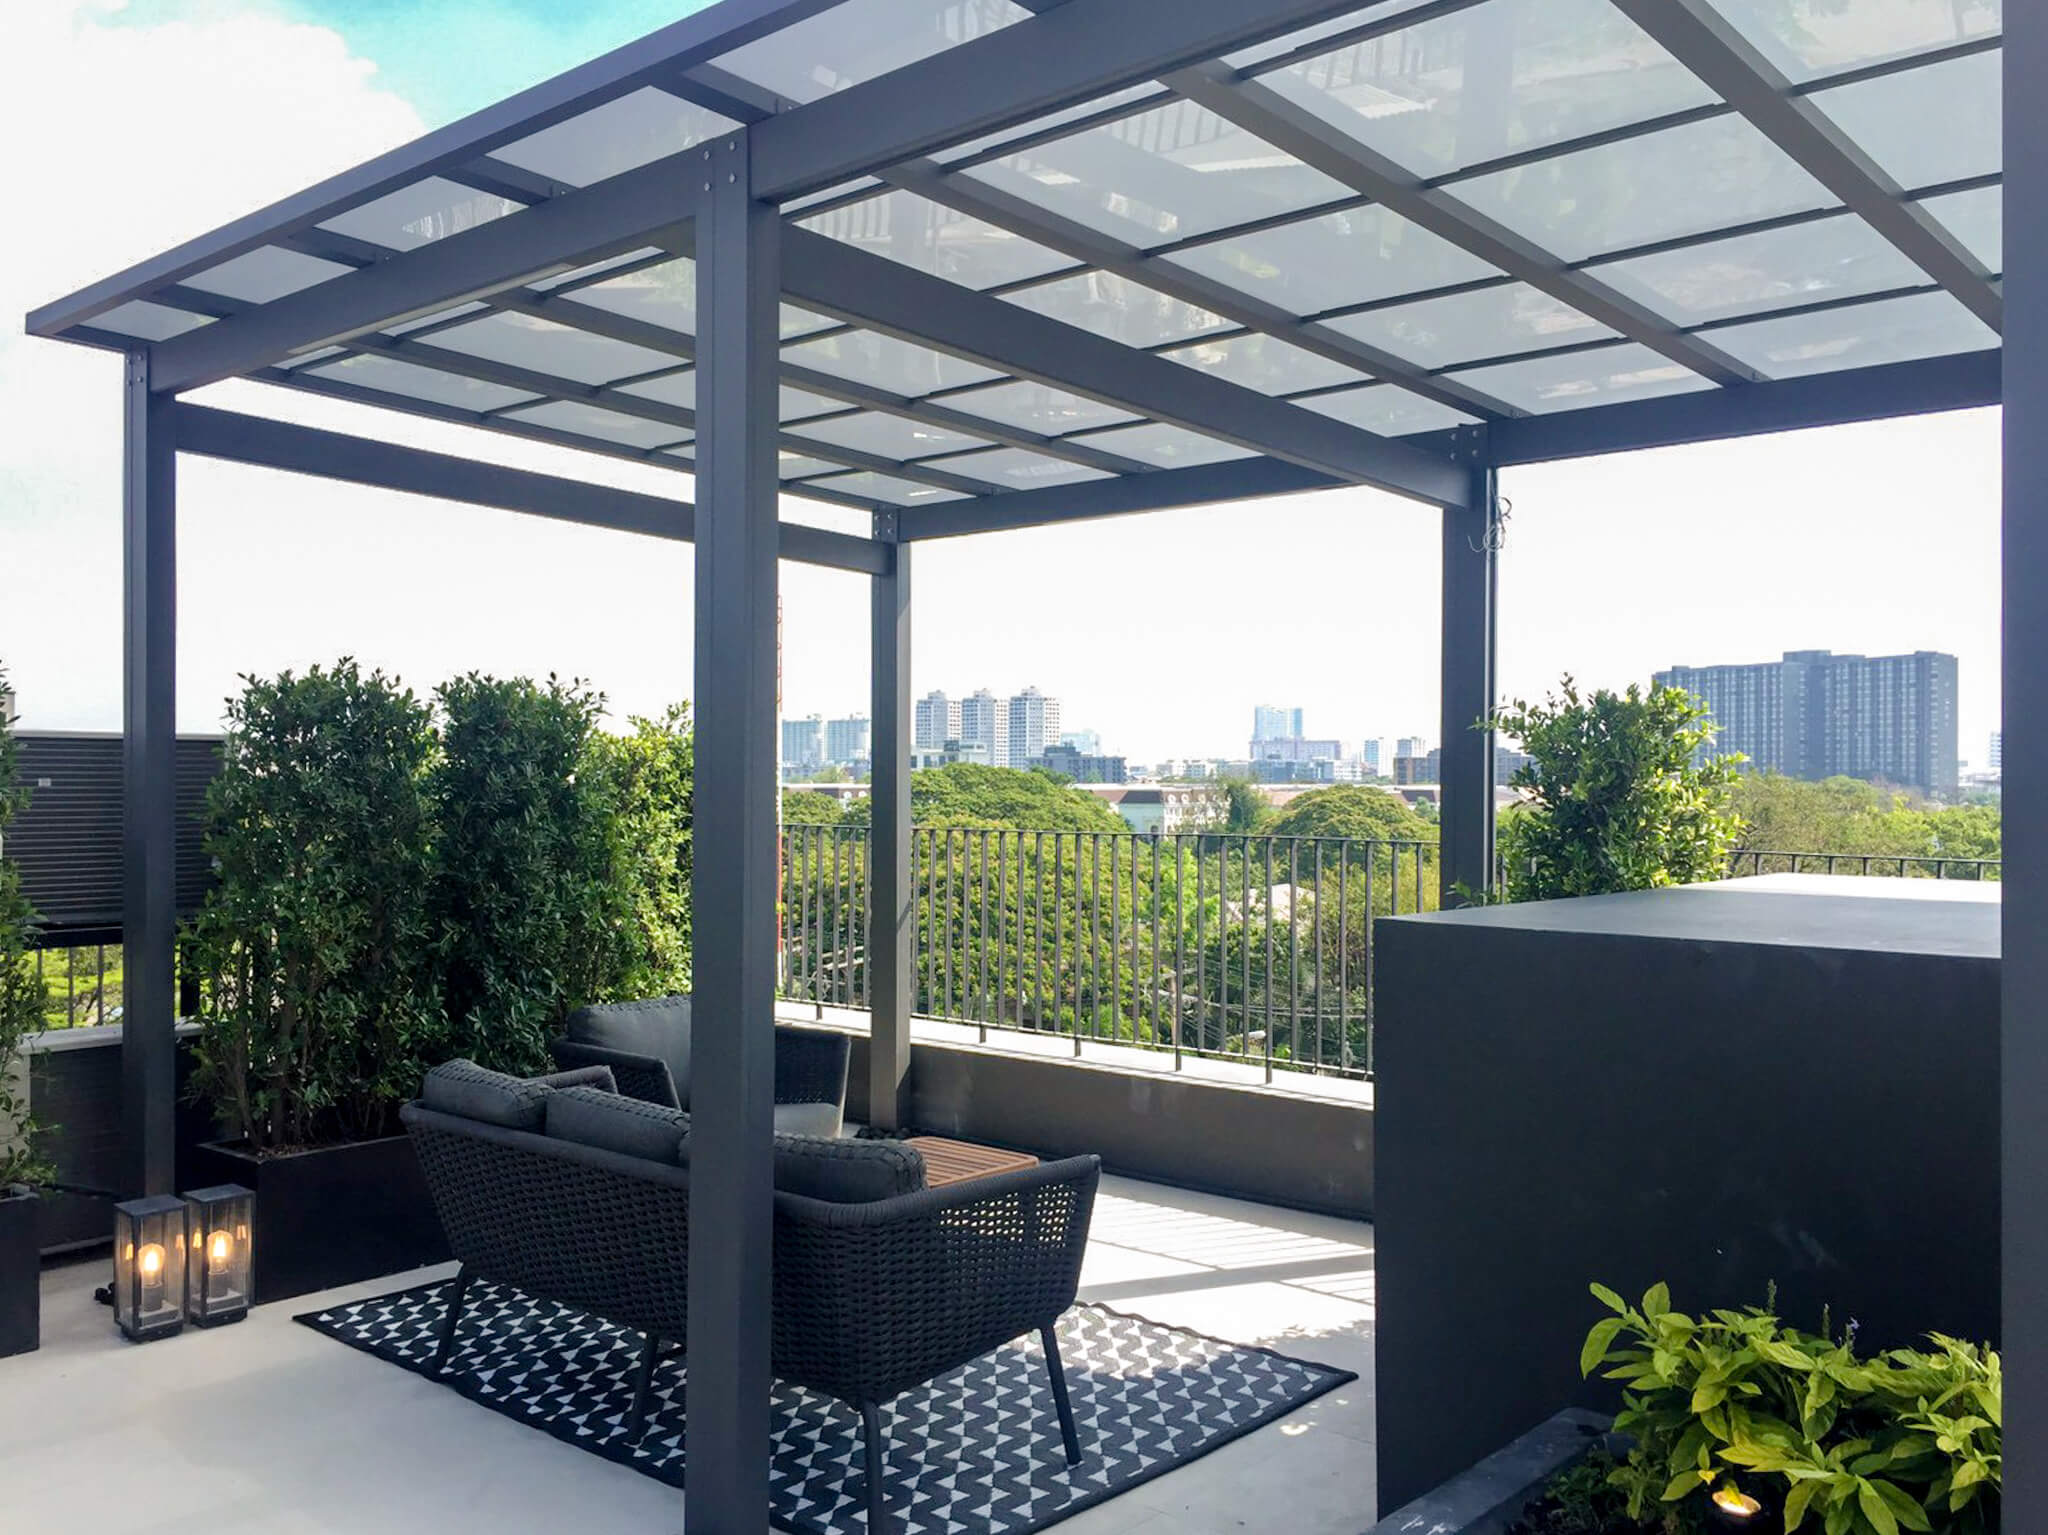 AIRES RAMA9 รีวิว Luxury Townhome 3.5 ชั้น + Rooftop ออกแบบสวย ย่านพระราม9 (ใกล้ รพ.สมิติเวช) 84 - AIRES